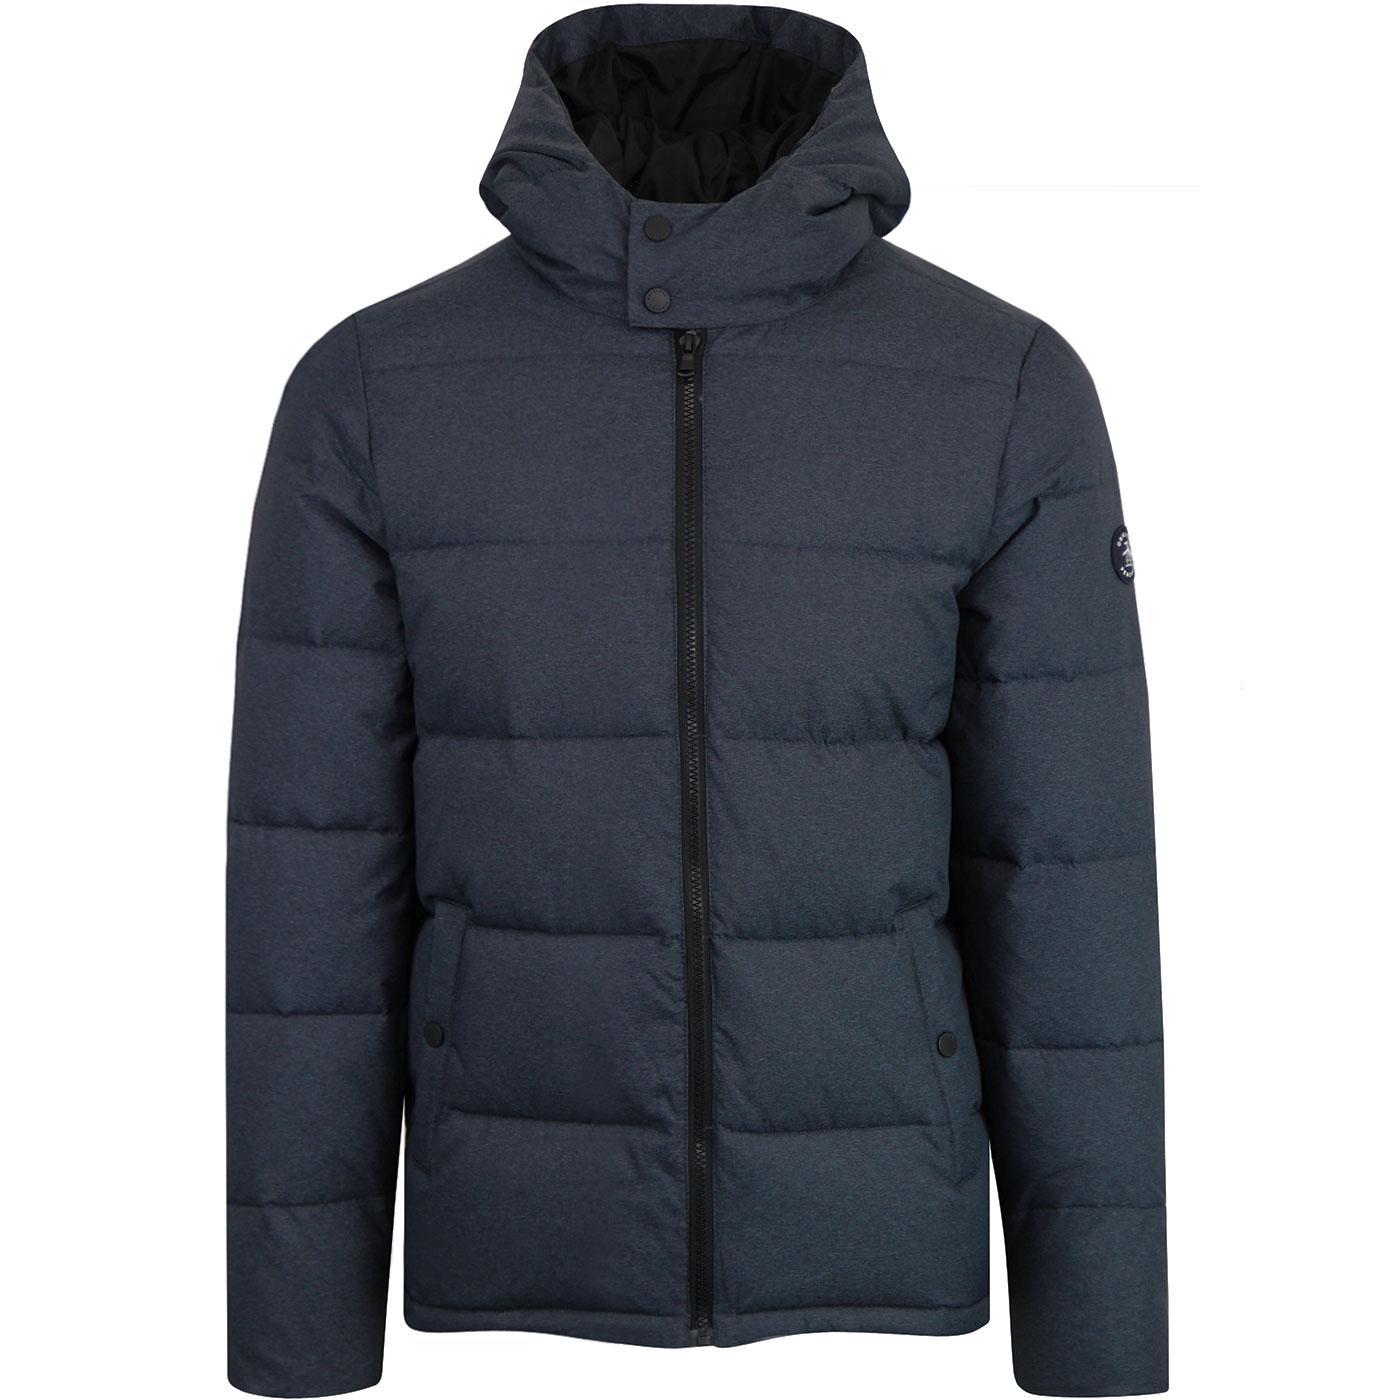 ORIGINAL PENGUIN Retro Insulated Puffer Jacket